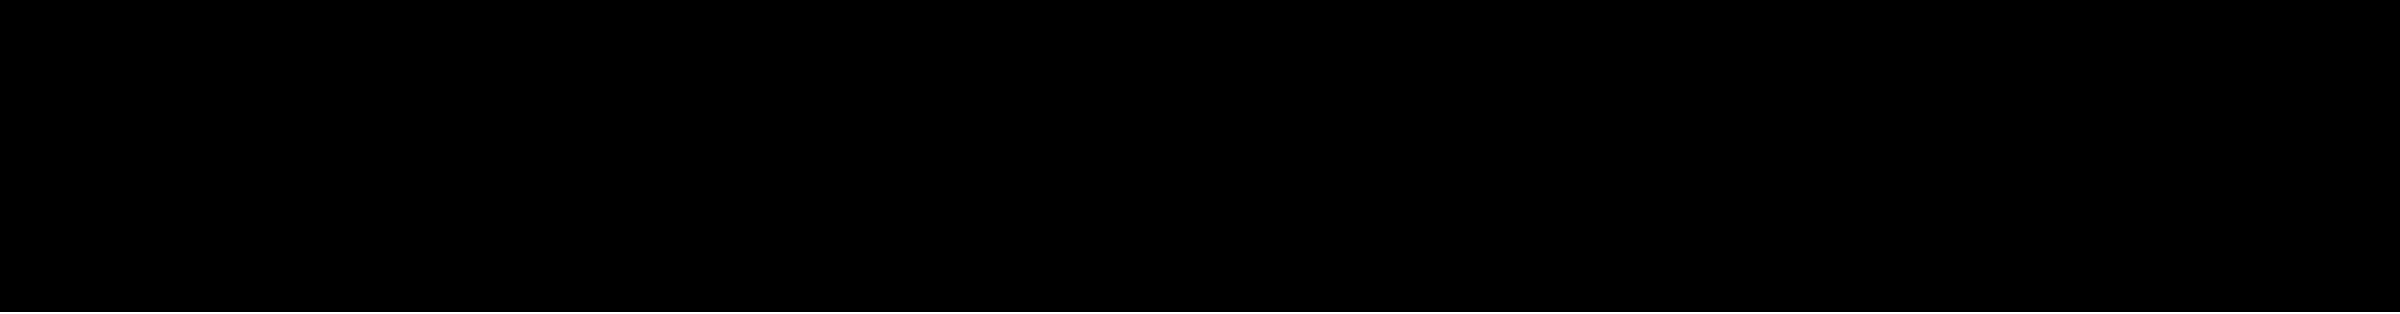 oracle-6-logo-png-transparent